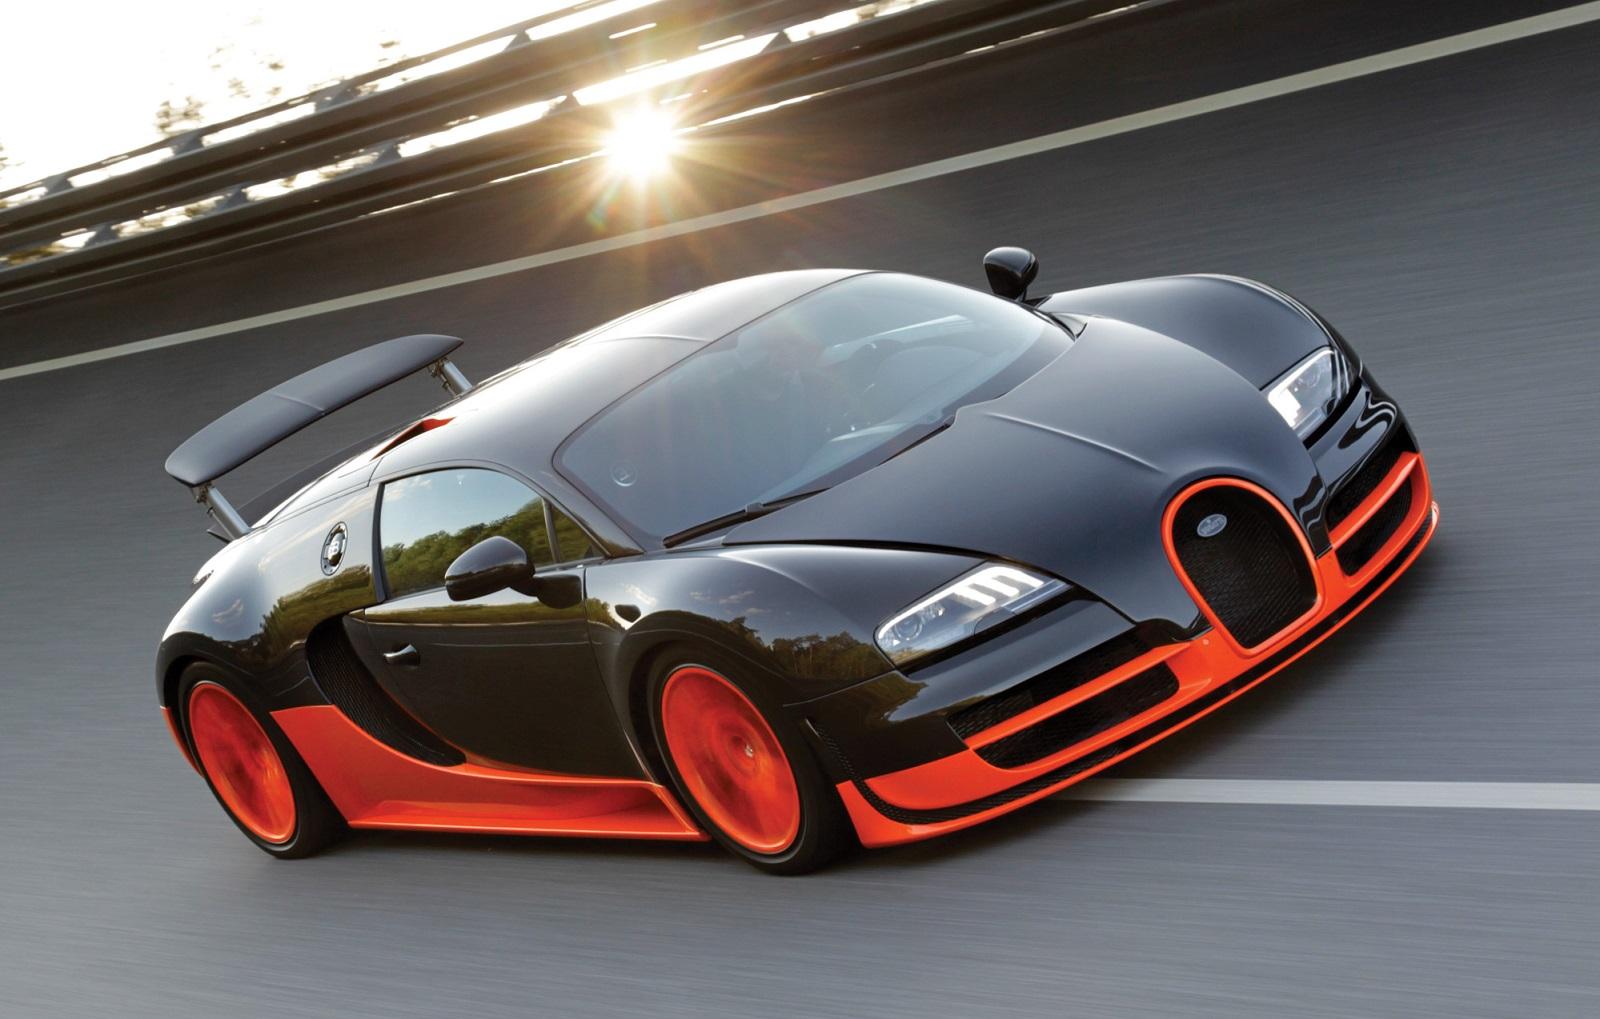 bugatti confirma sucessor de veyron motor. Black Bedroom Furniture Sets. Home Design Ideas